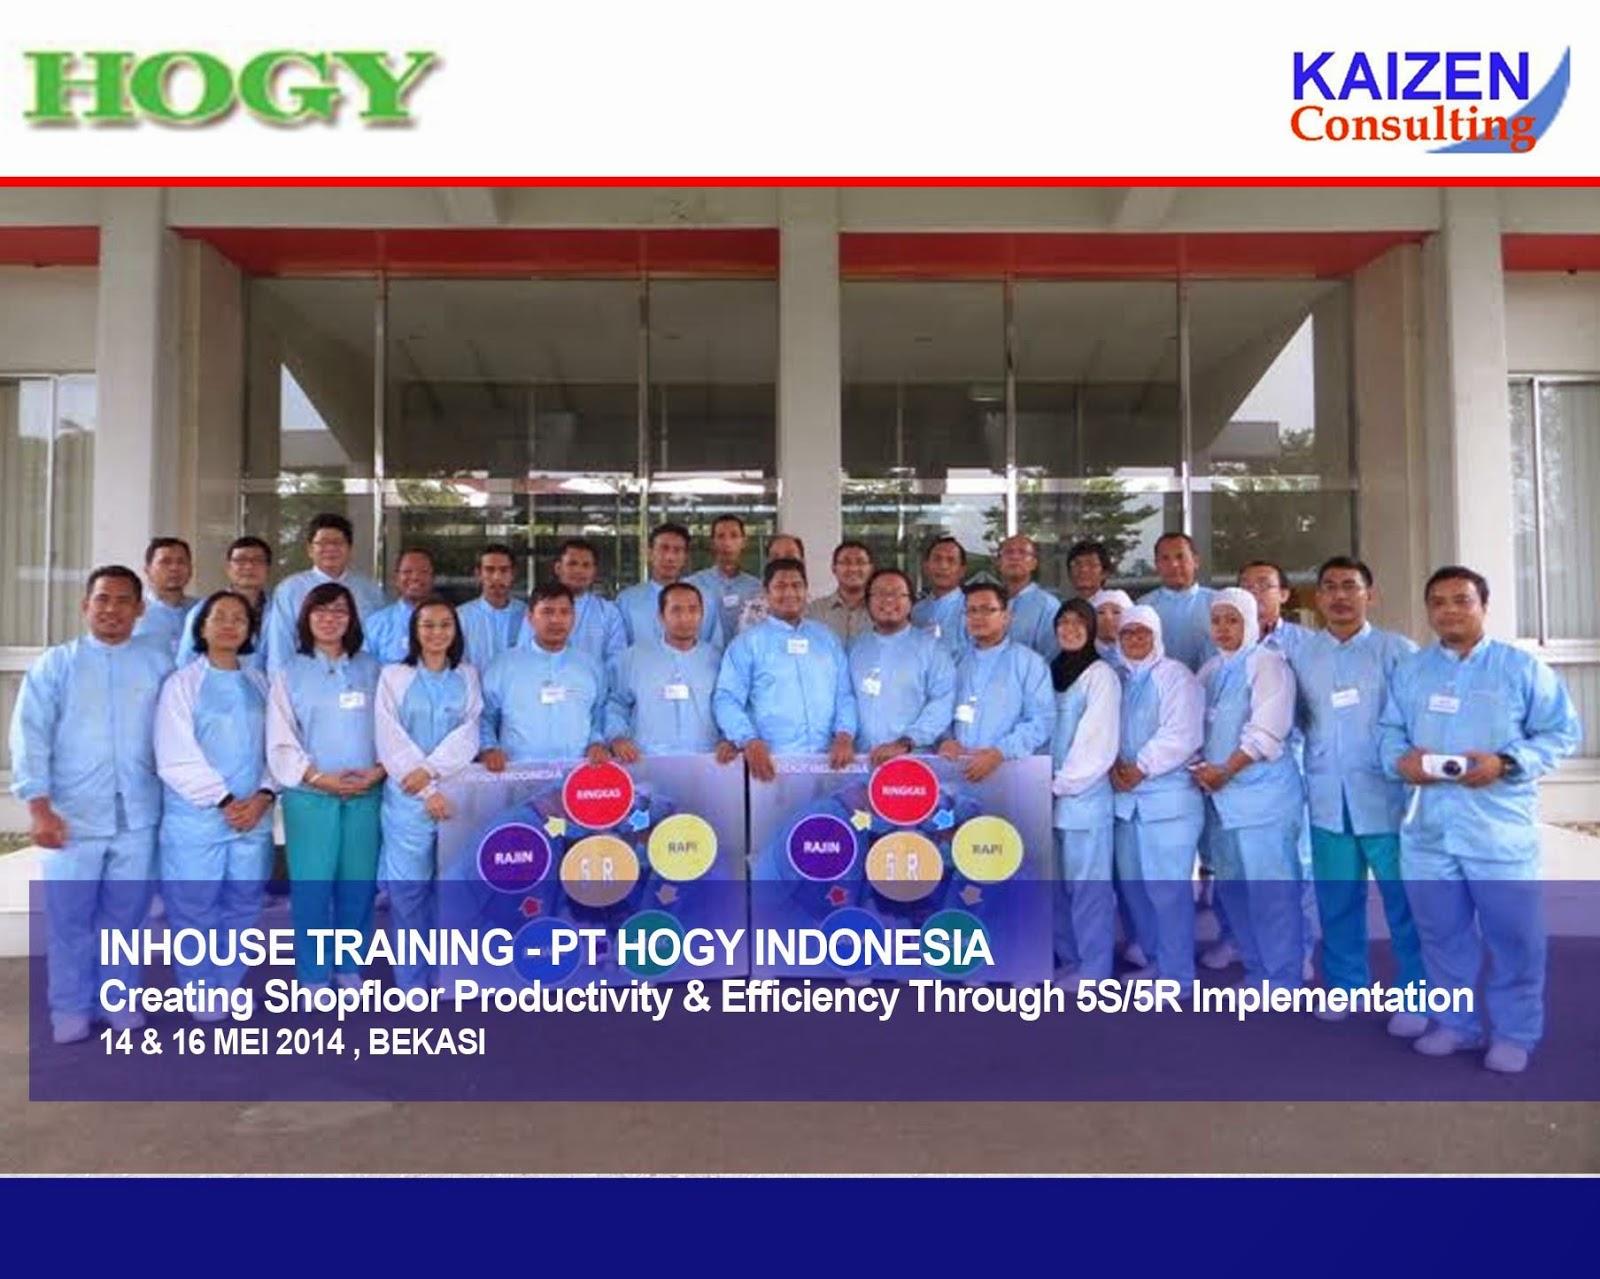 Pt. hogy indonesia 2015 - blog lupy hakim - portal informasi terbaru